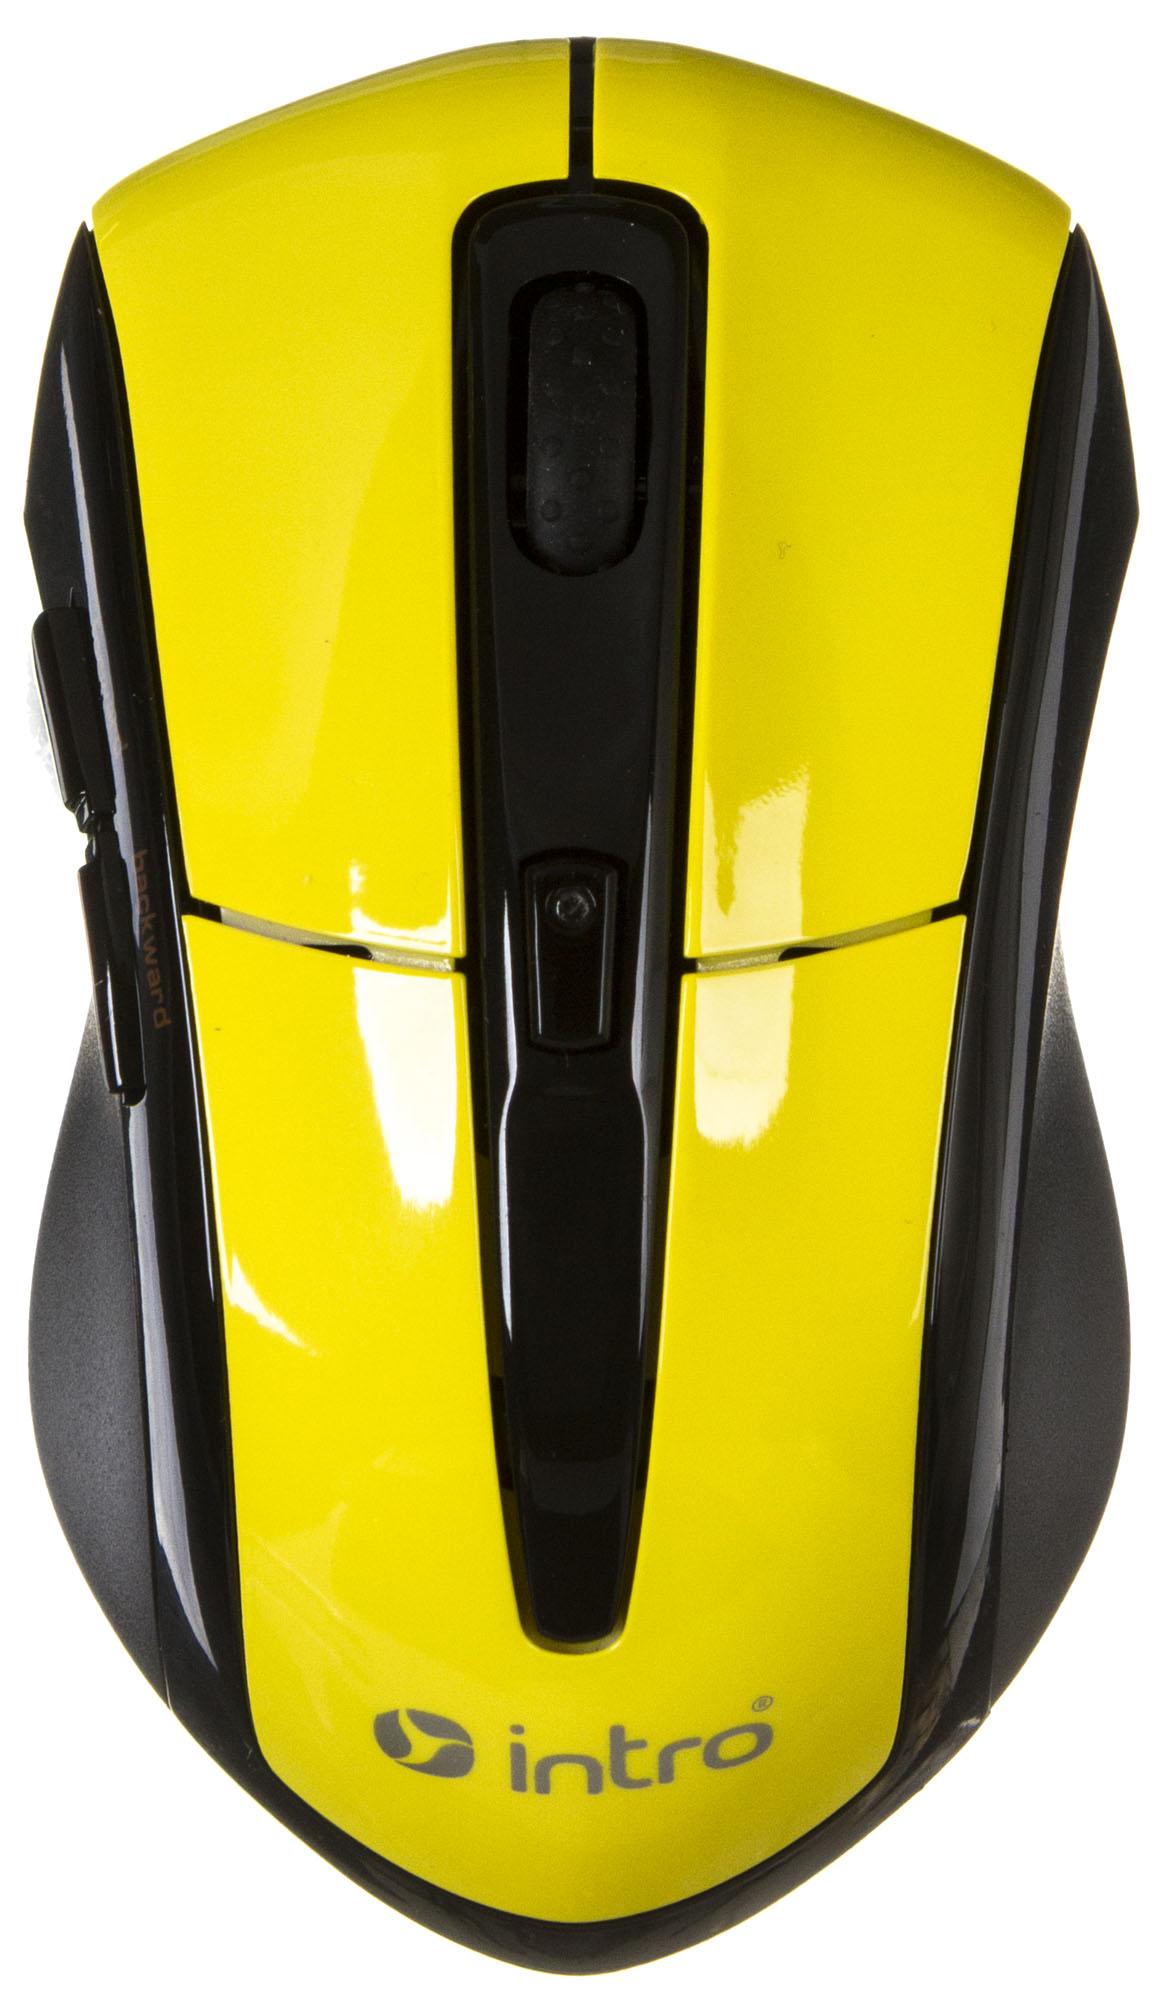 Компьютерная мышь Intro MW207 mouse Wireless Black-Yellow USB